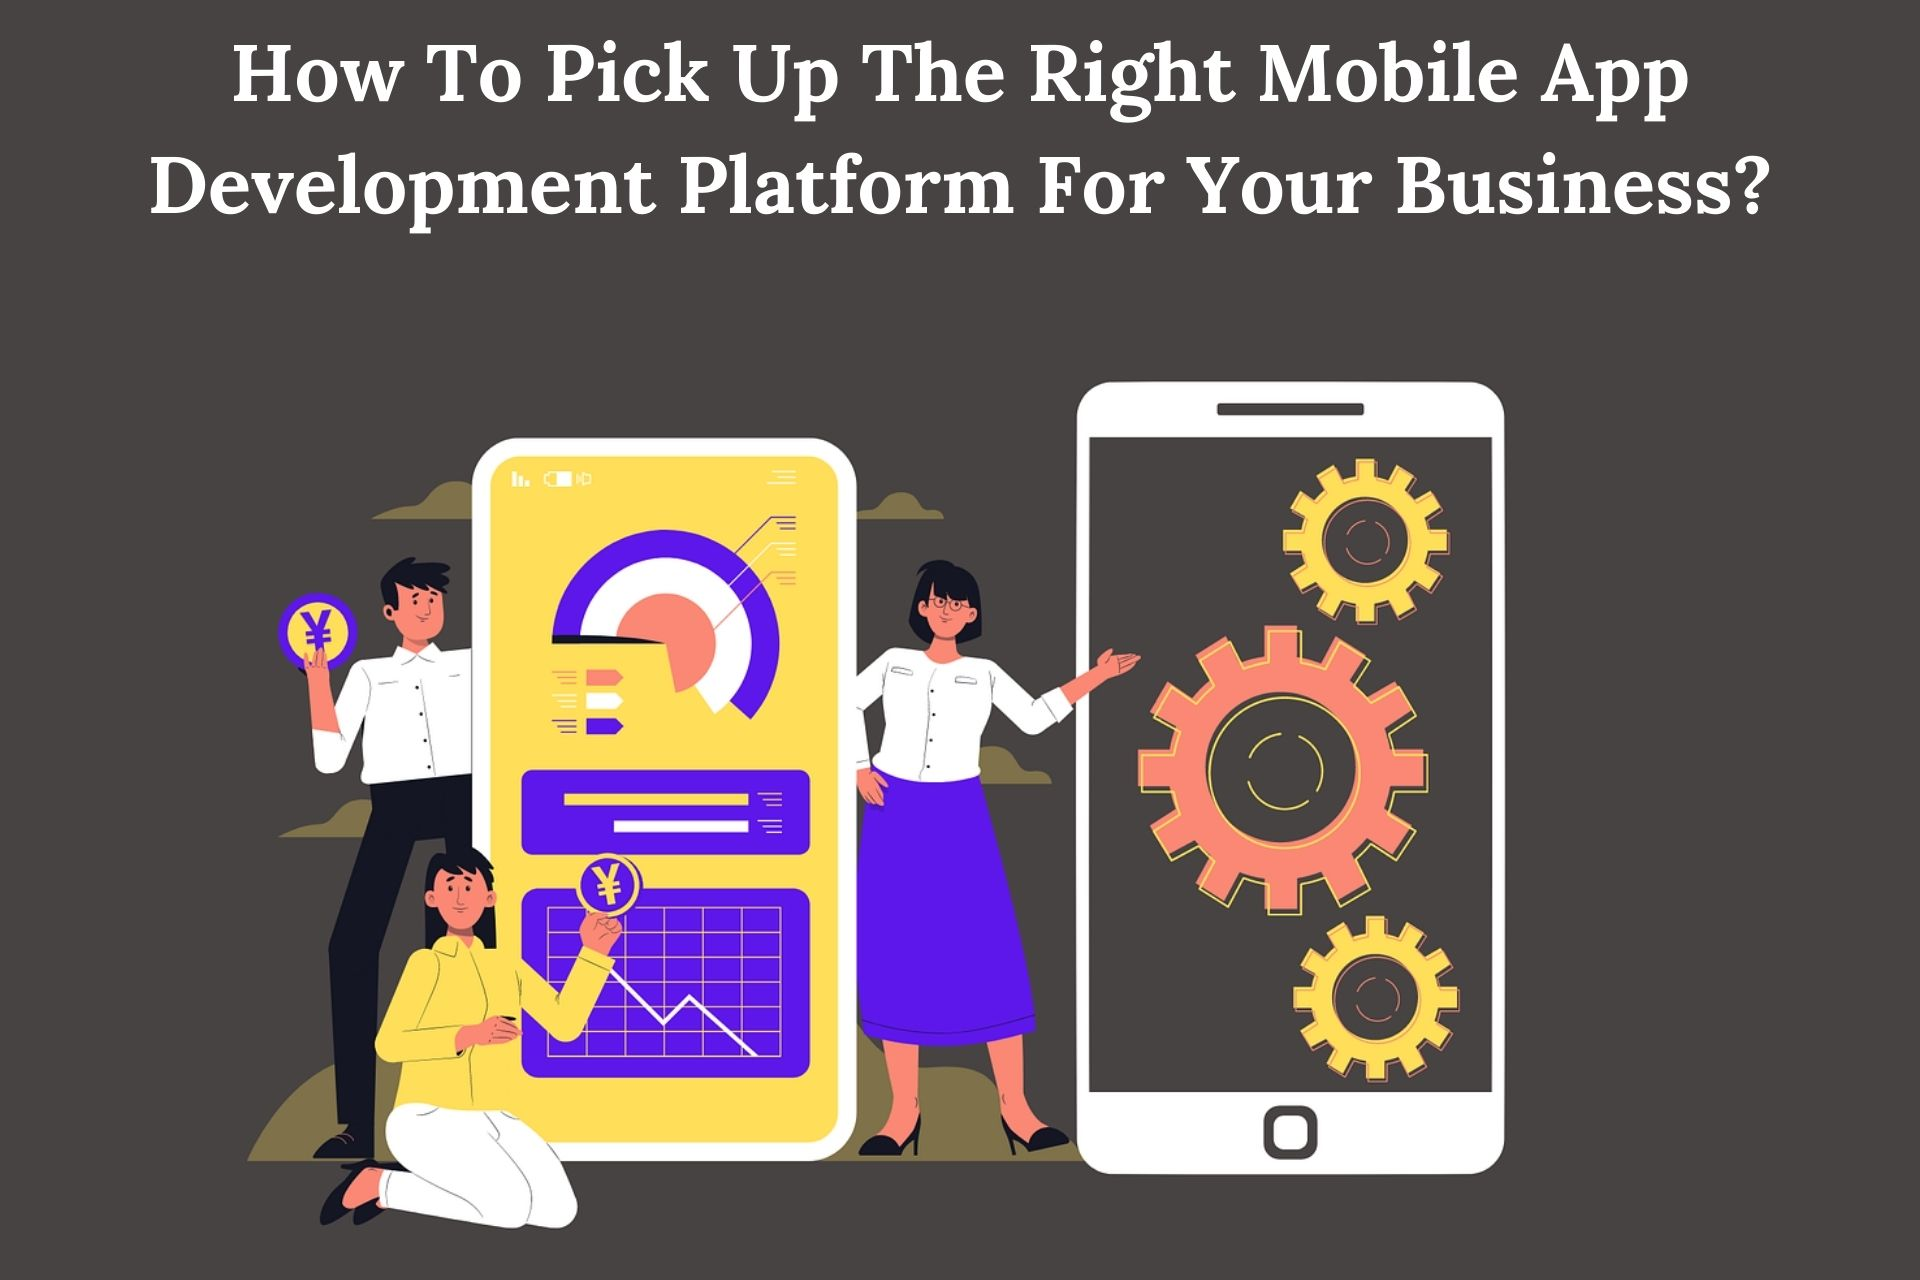 Mobile App Development Platform For Your Business